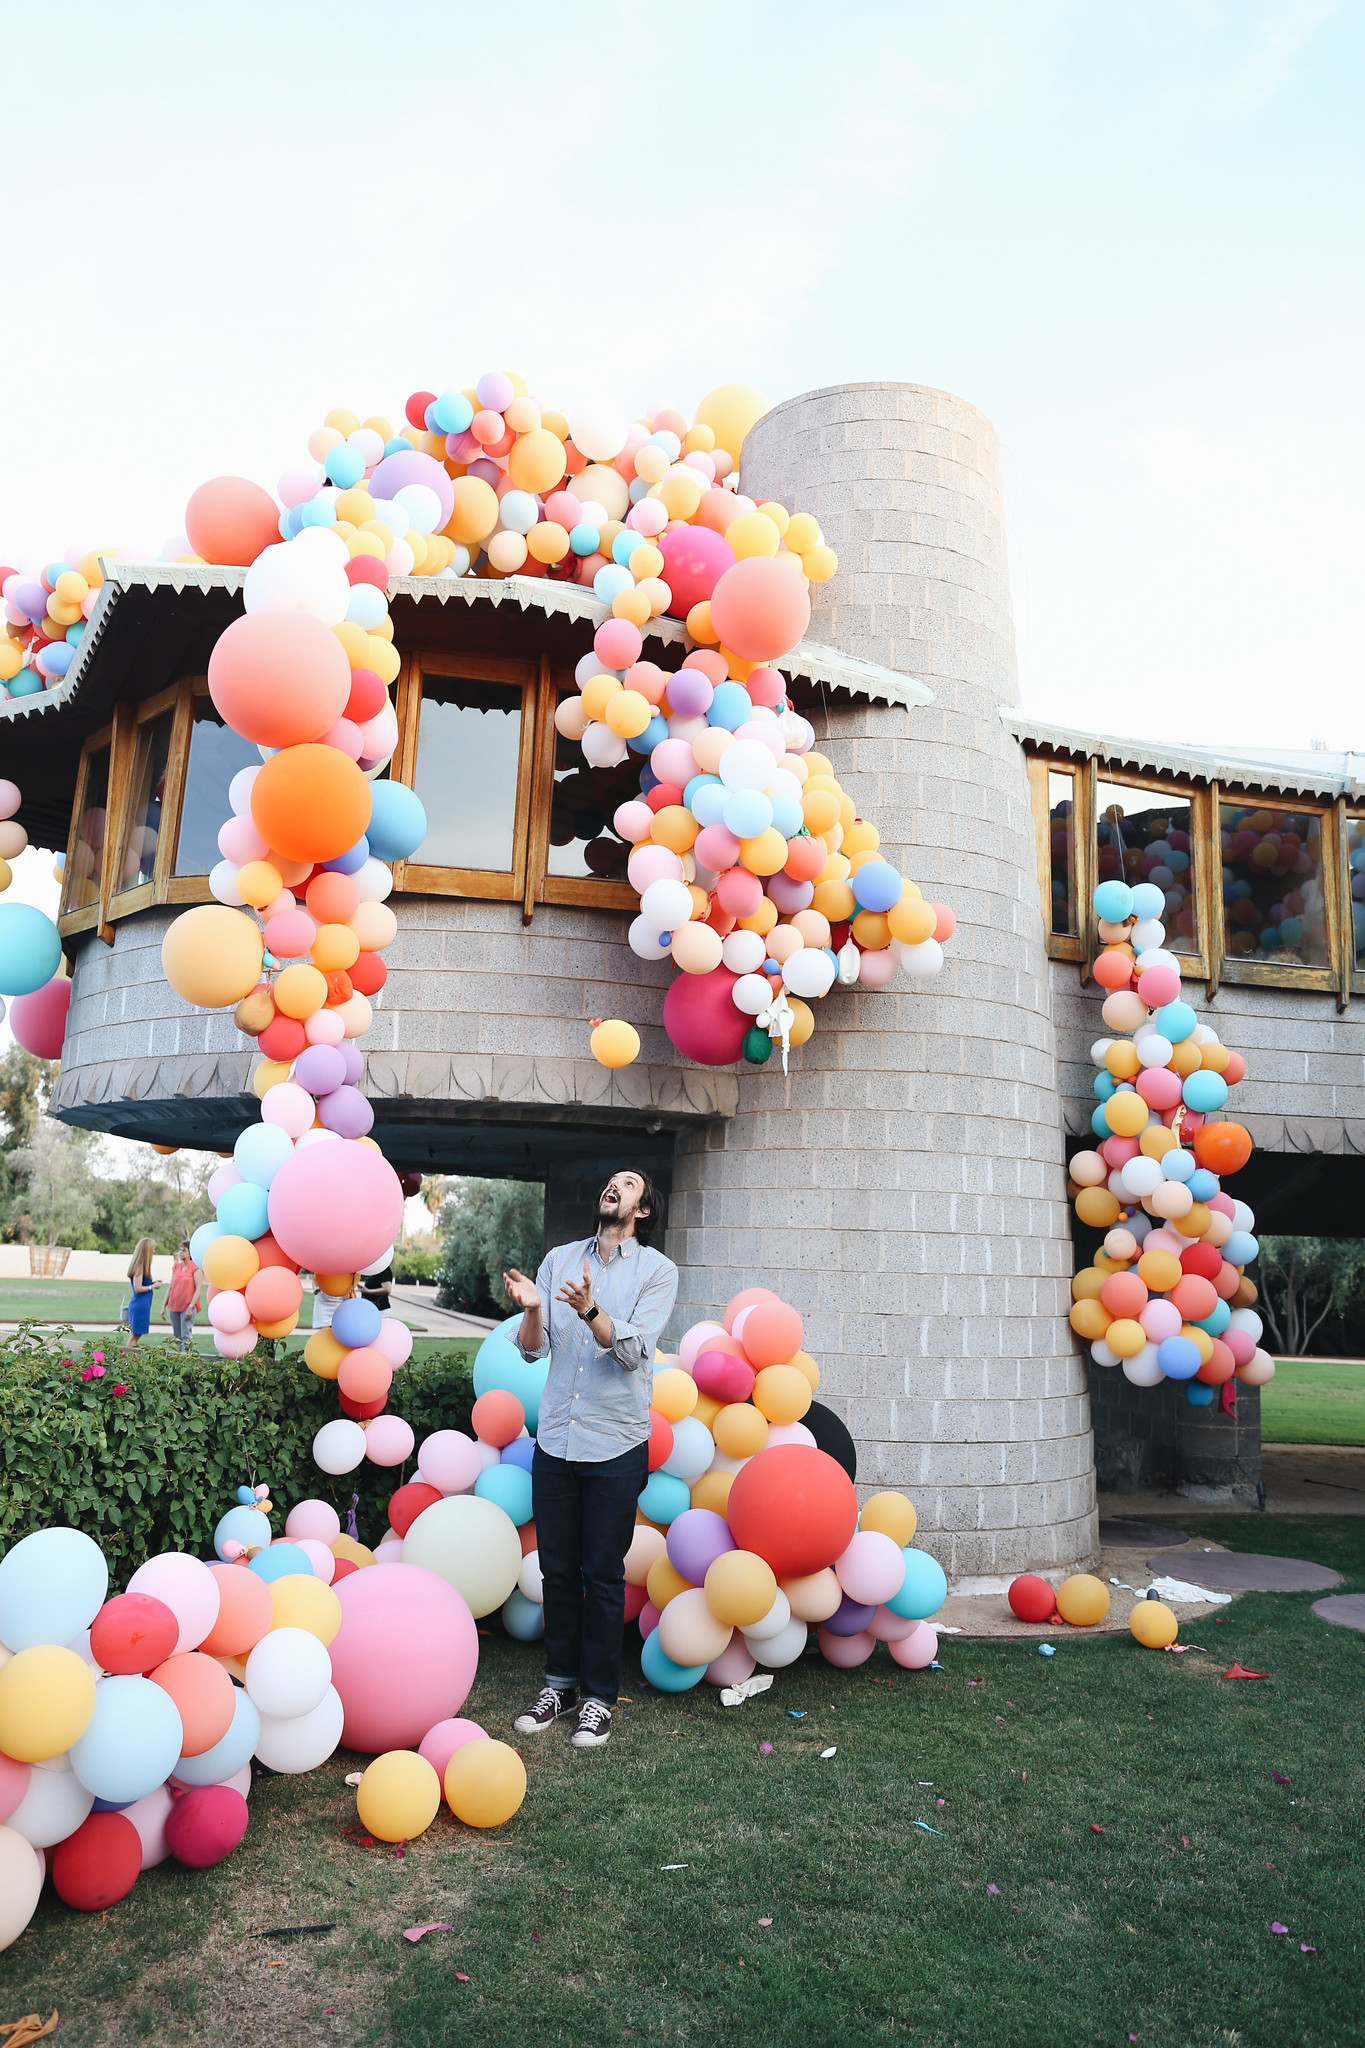 geronimo balloons x david wright house u2014 chelsea bird